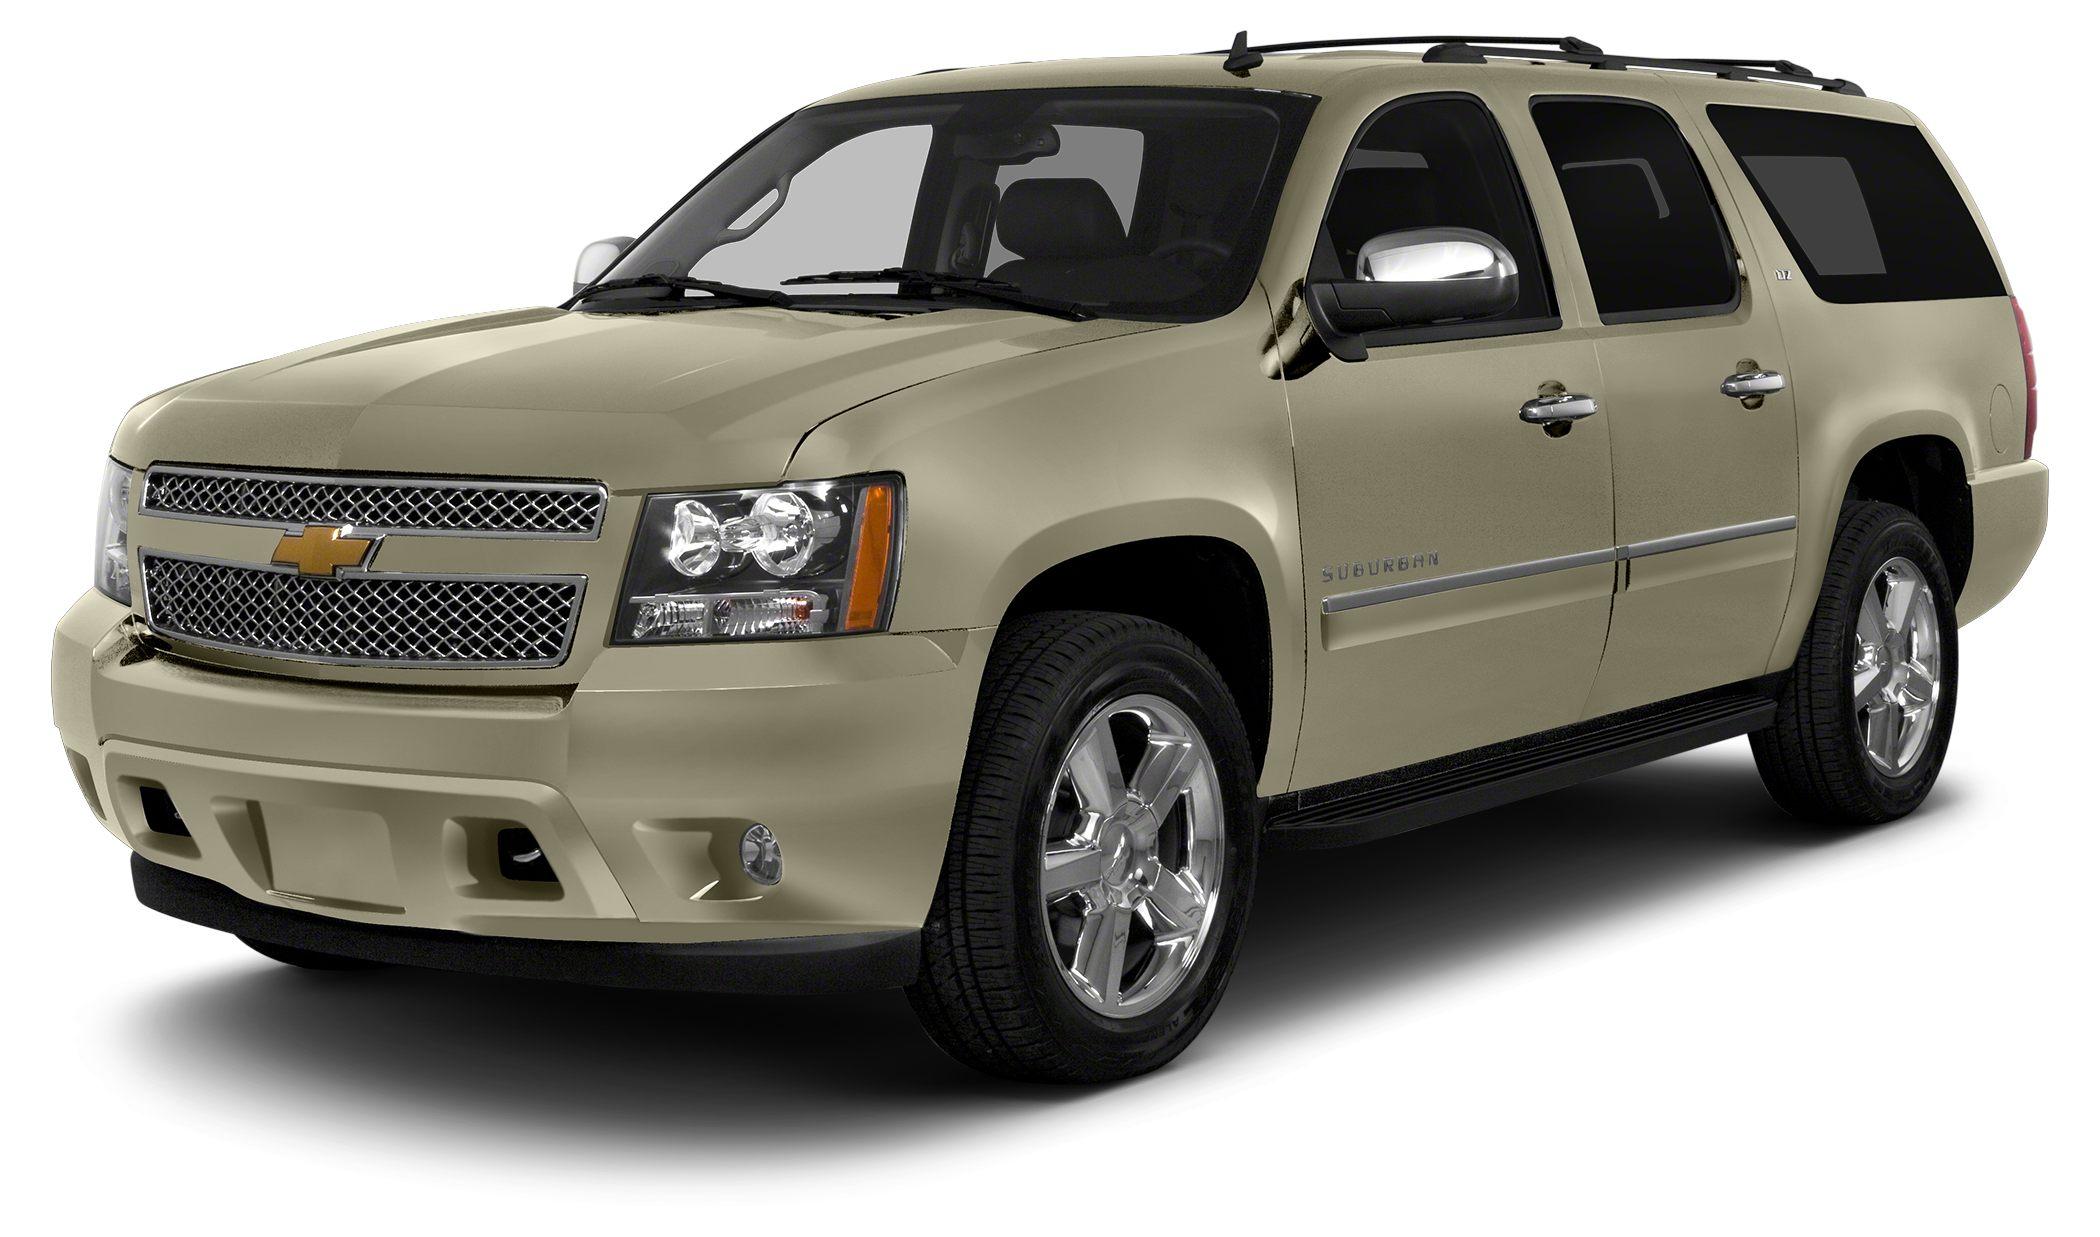 2014 Chevrolet Suburban 1500 LT Miles 40125Color Tan Stock F5328A VIN 1GNSCJE04ER200372